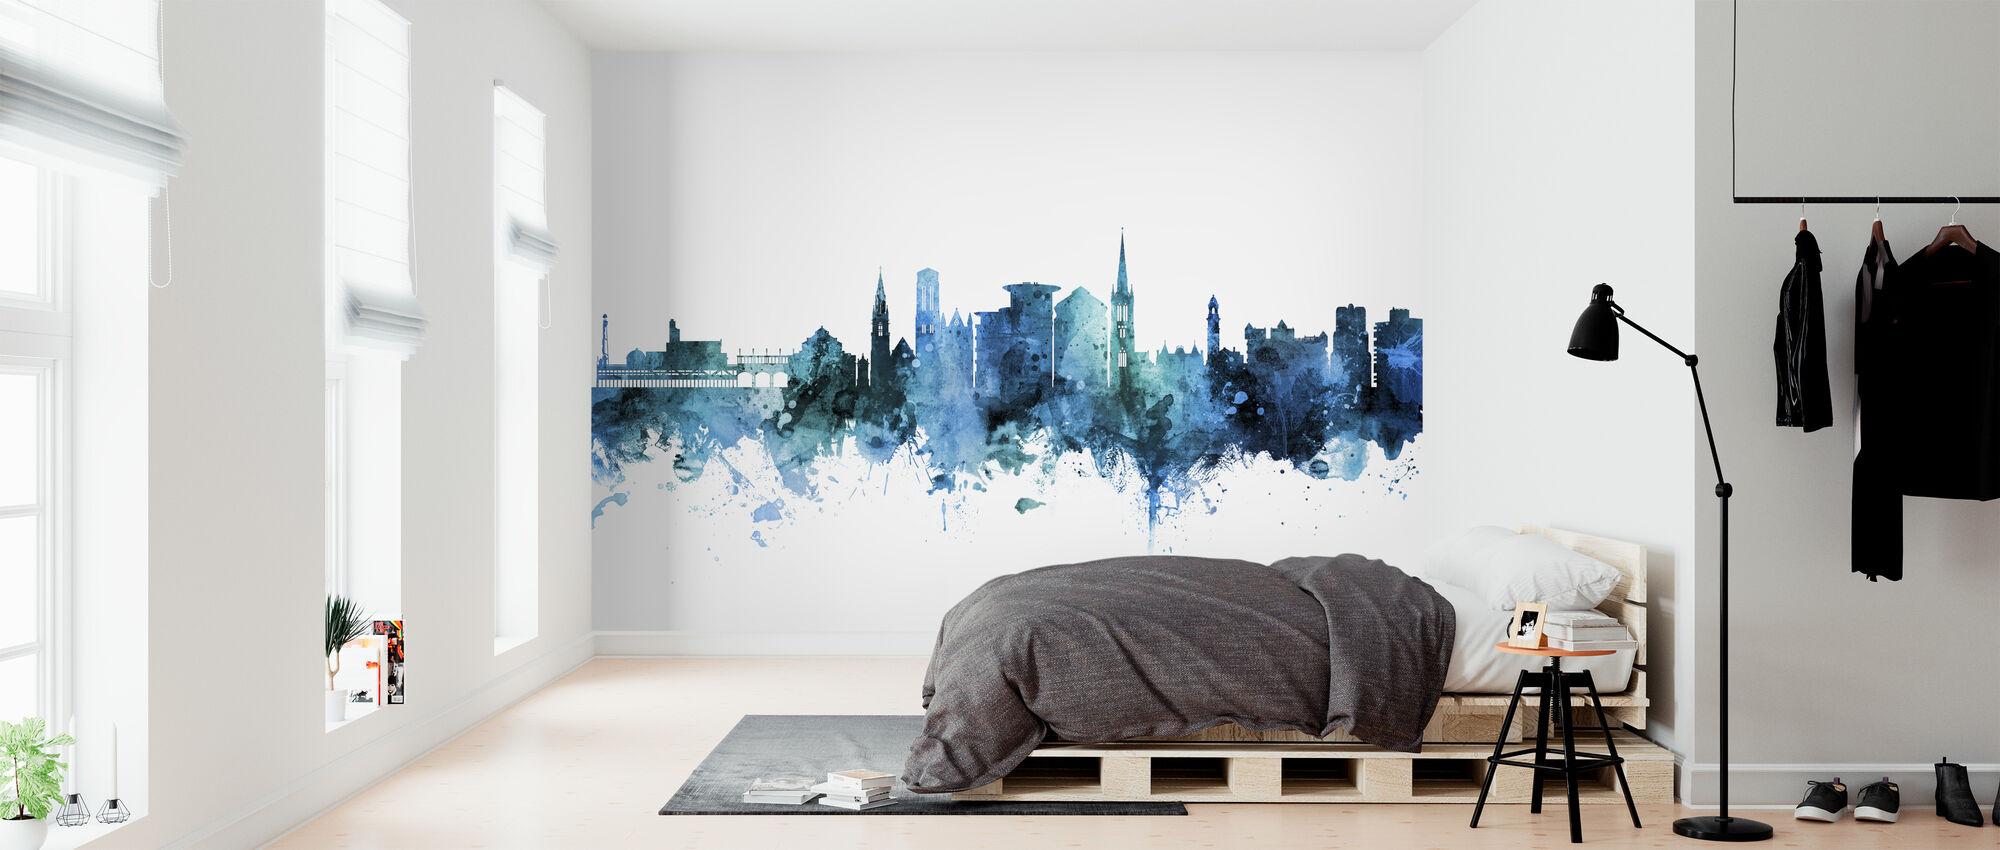 Bournemouth England Skyline - Wallpaper - Bedroom